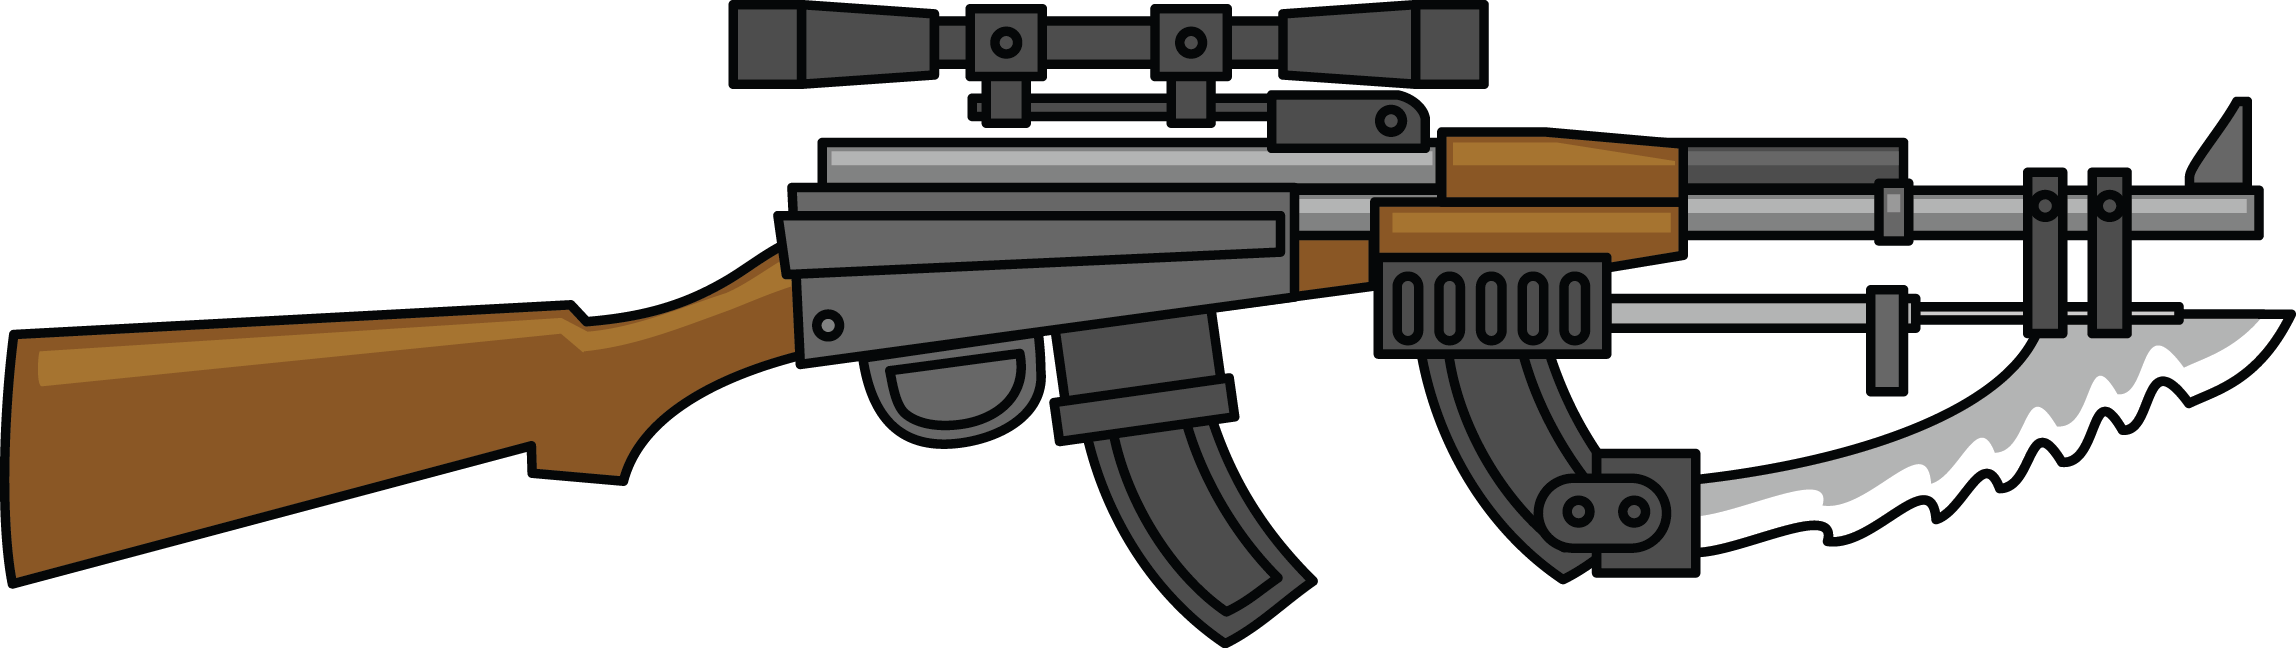 clip art transparent stock Cartoon free download best. Army gun clipart